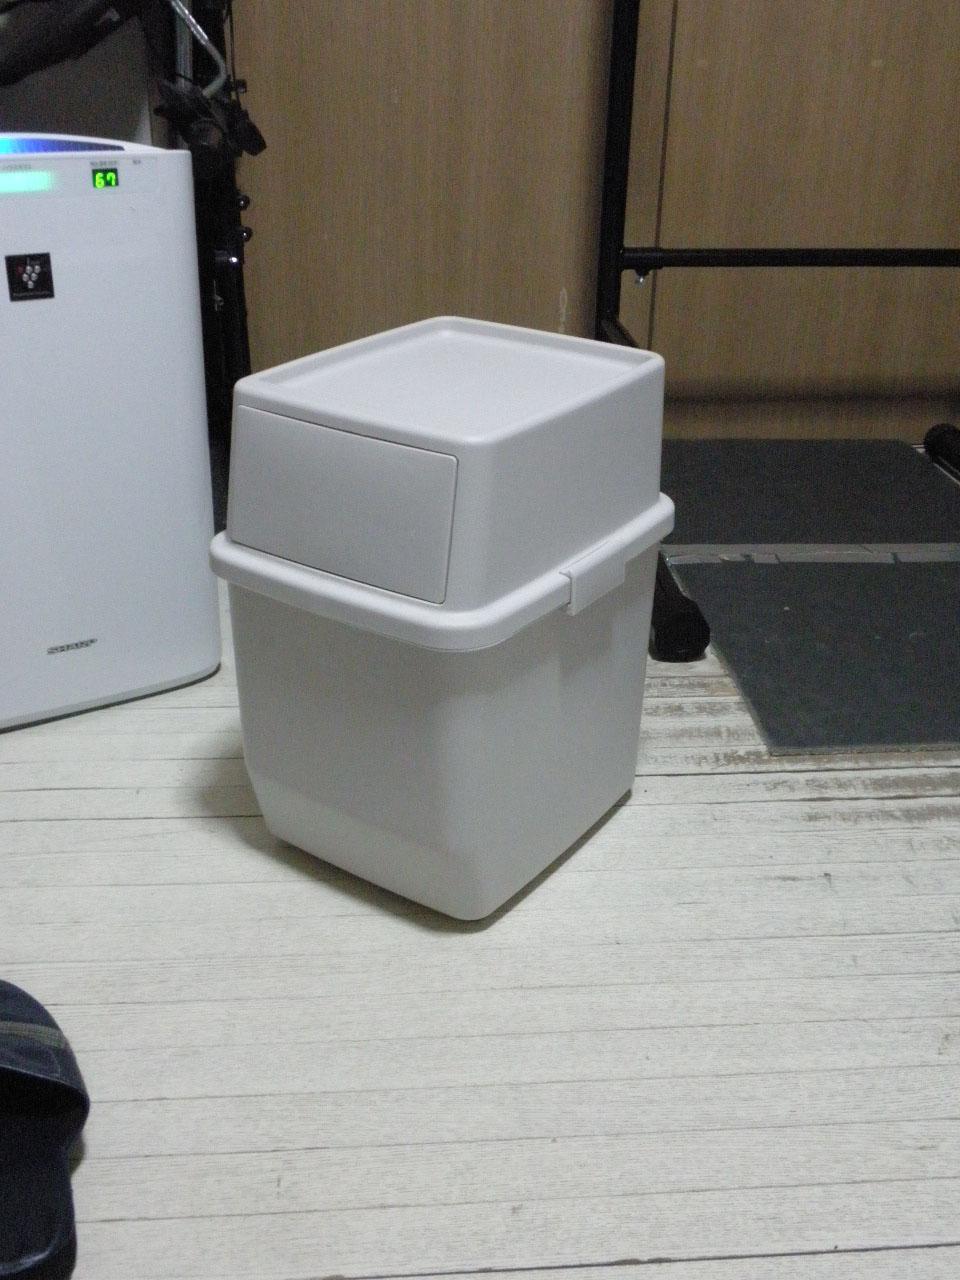 Re: ゴミ箱